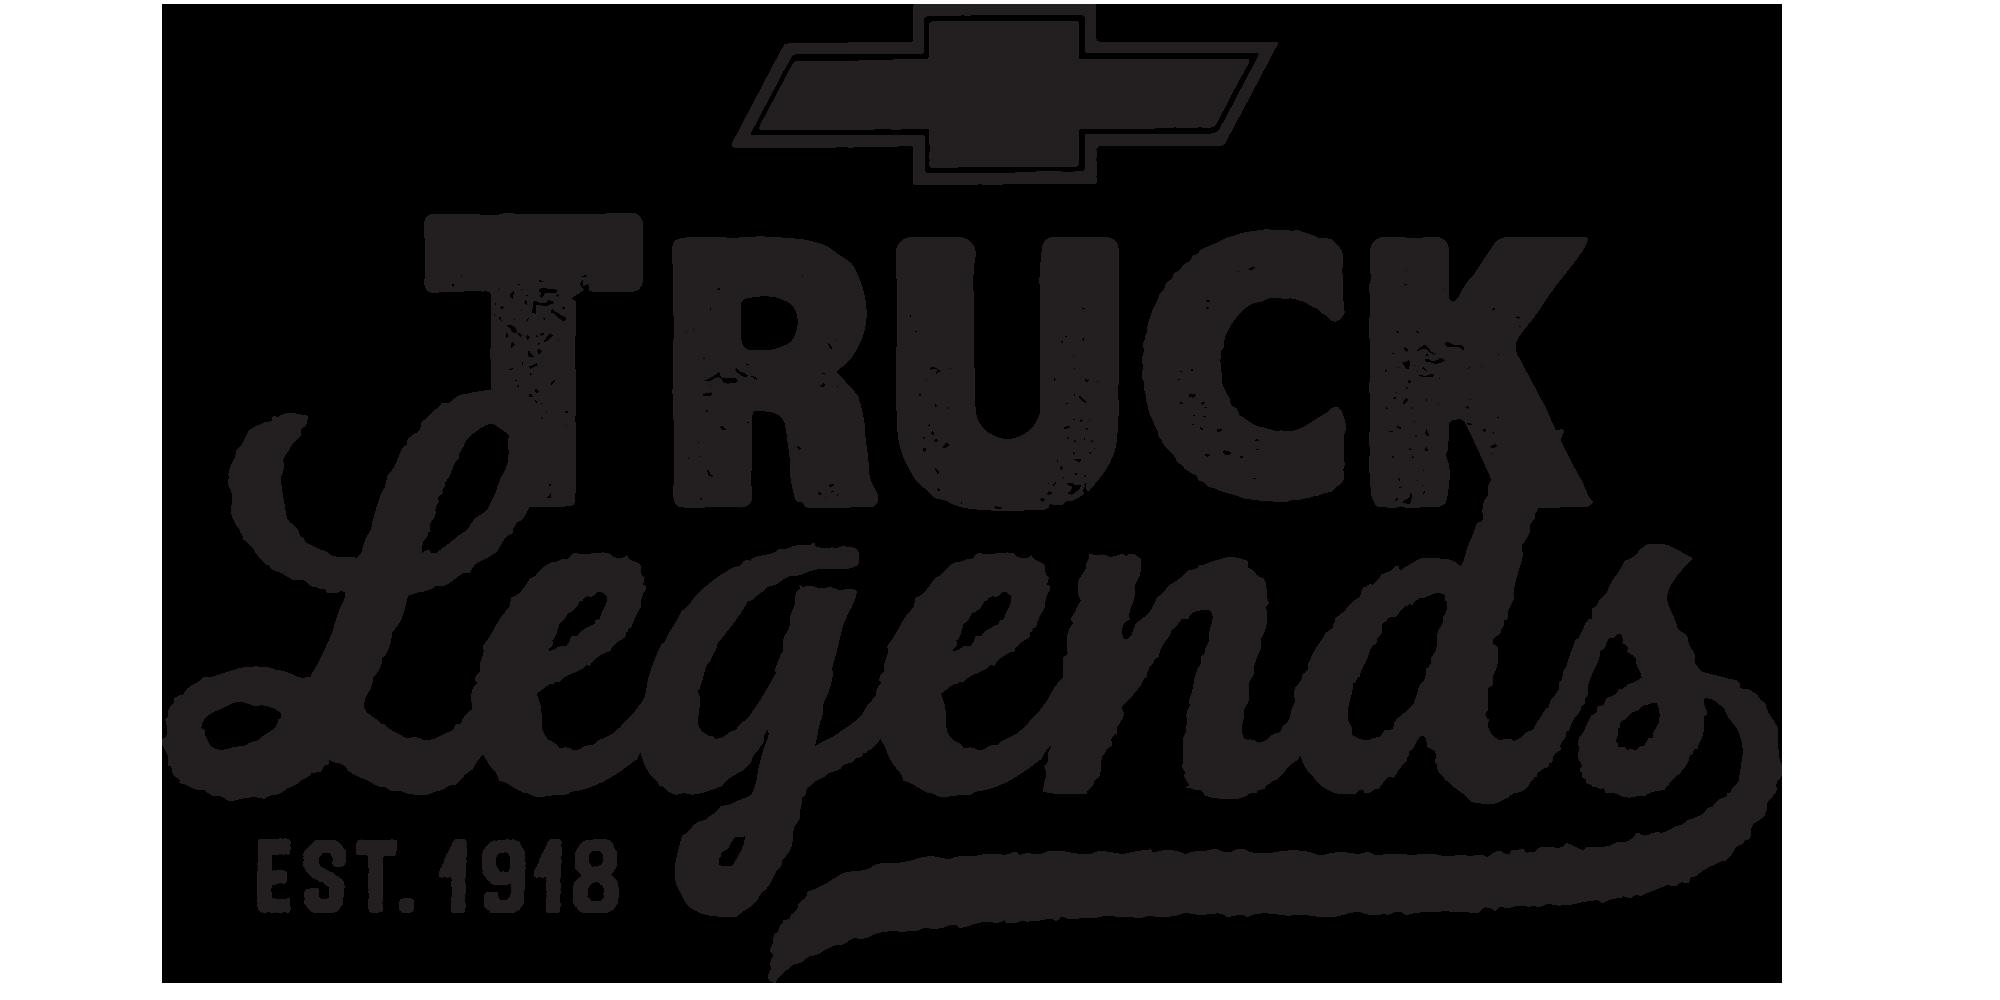 Ícono de leyendas de camionetas Chevrolet